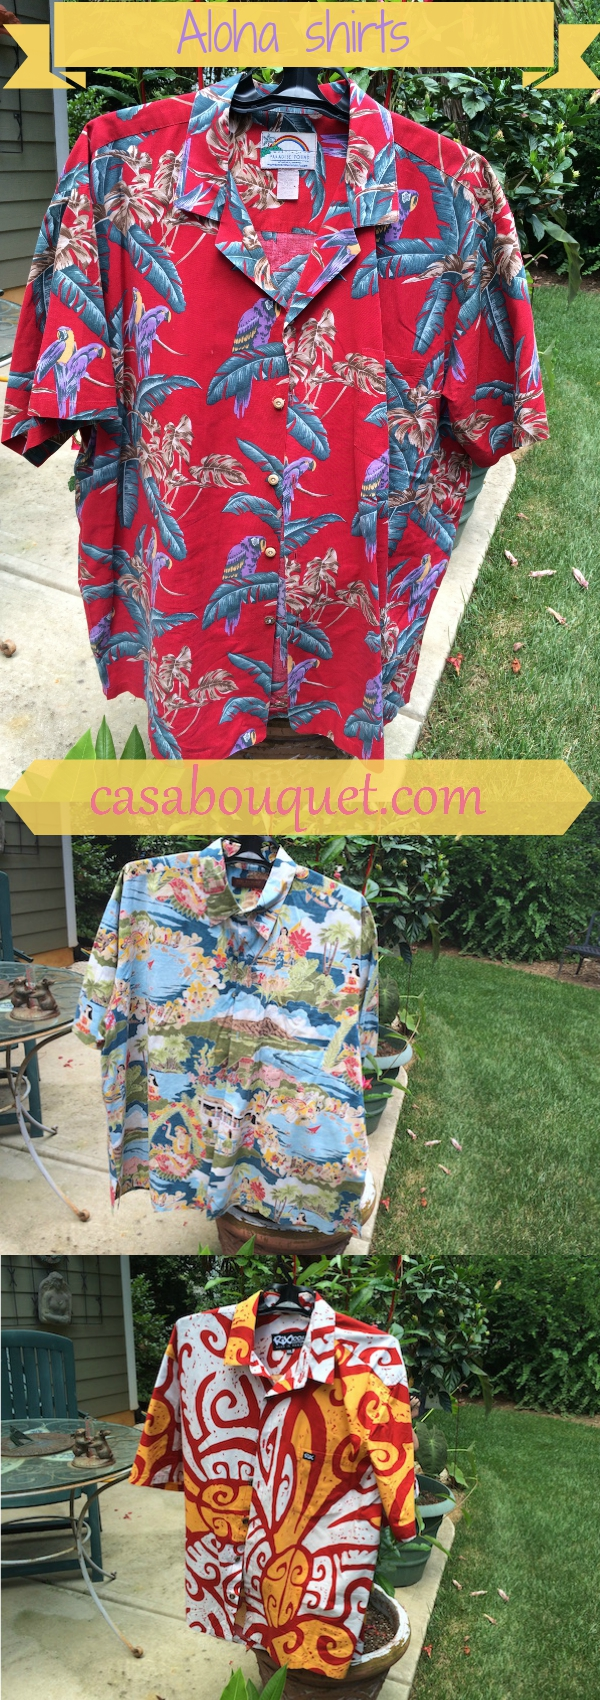 "Aloha shirts or Hawaiian shirts are well-known icons of Hawaii that help us ""live aloha"" every day. Designers and history here."